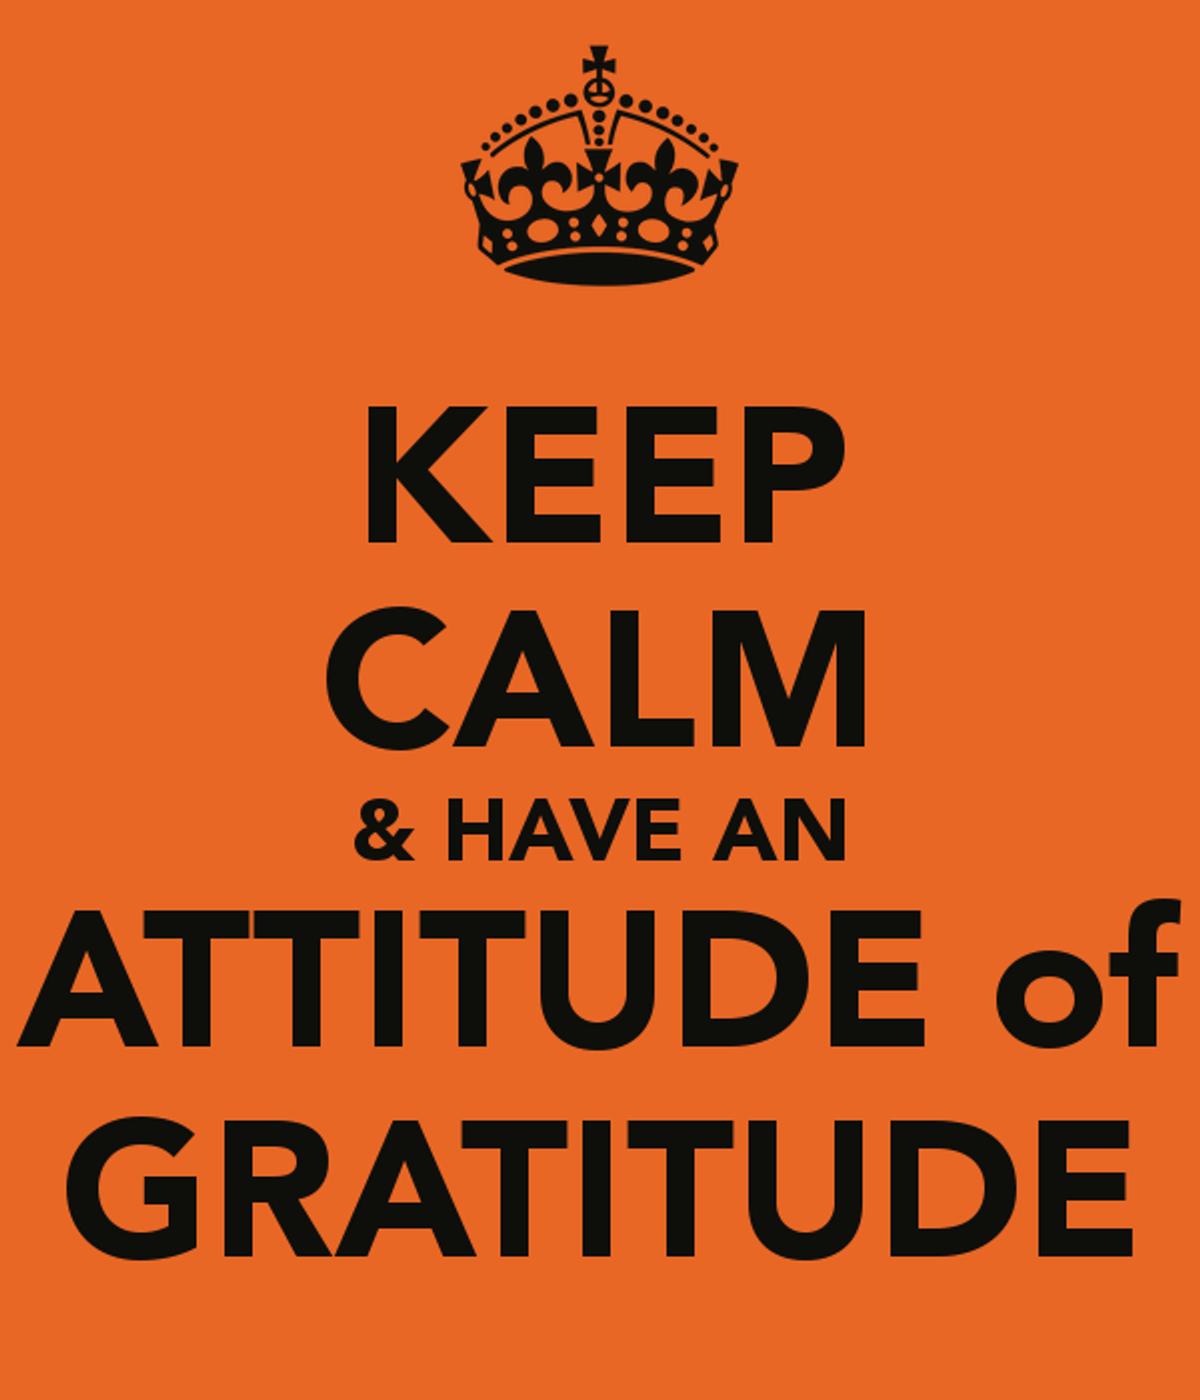 Attitude Is A Make Or Break Foundation